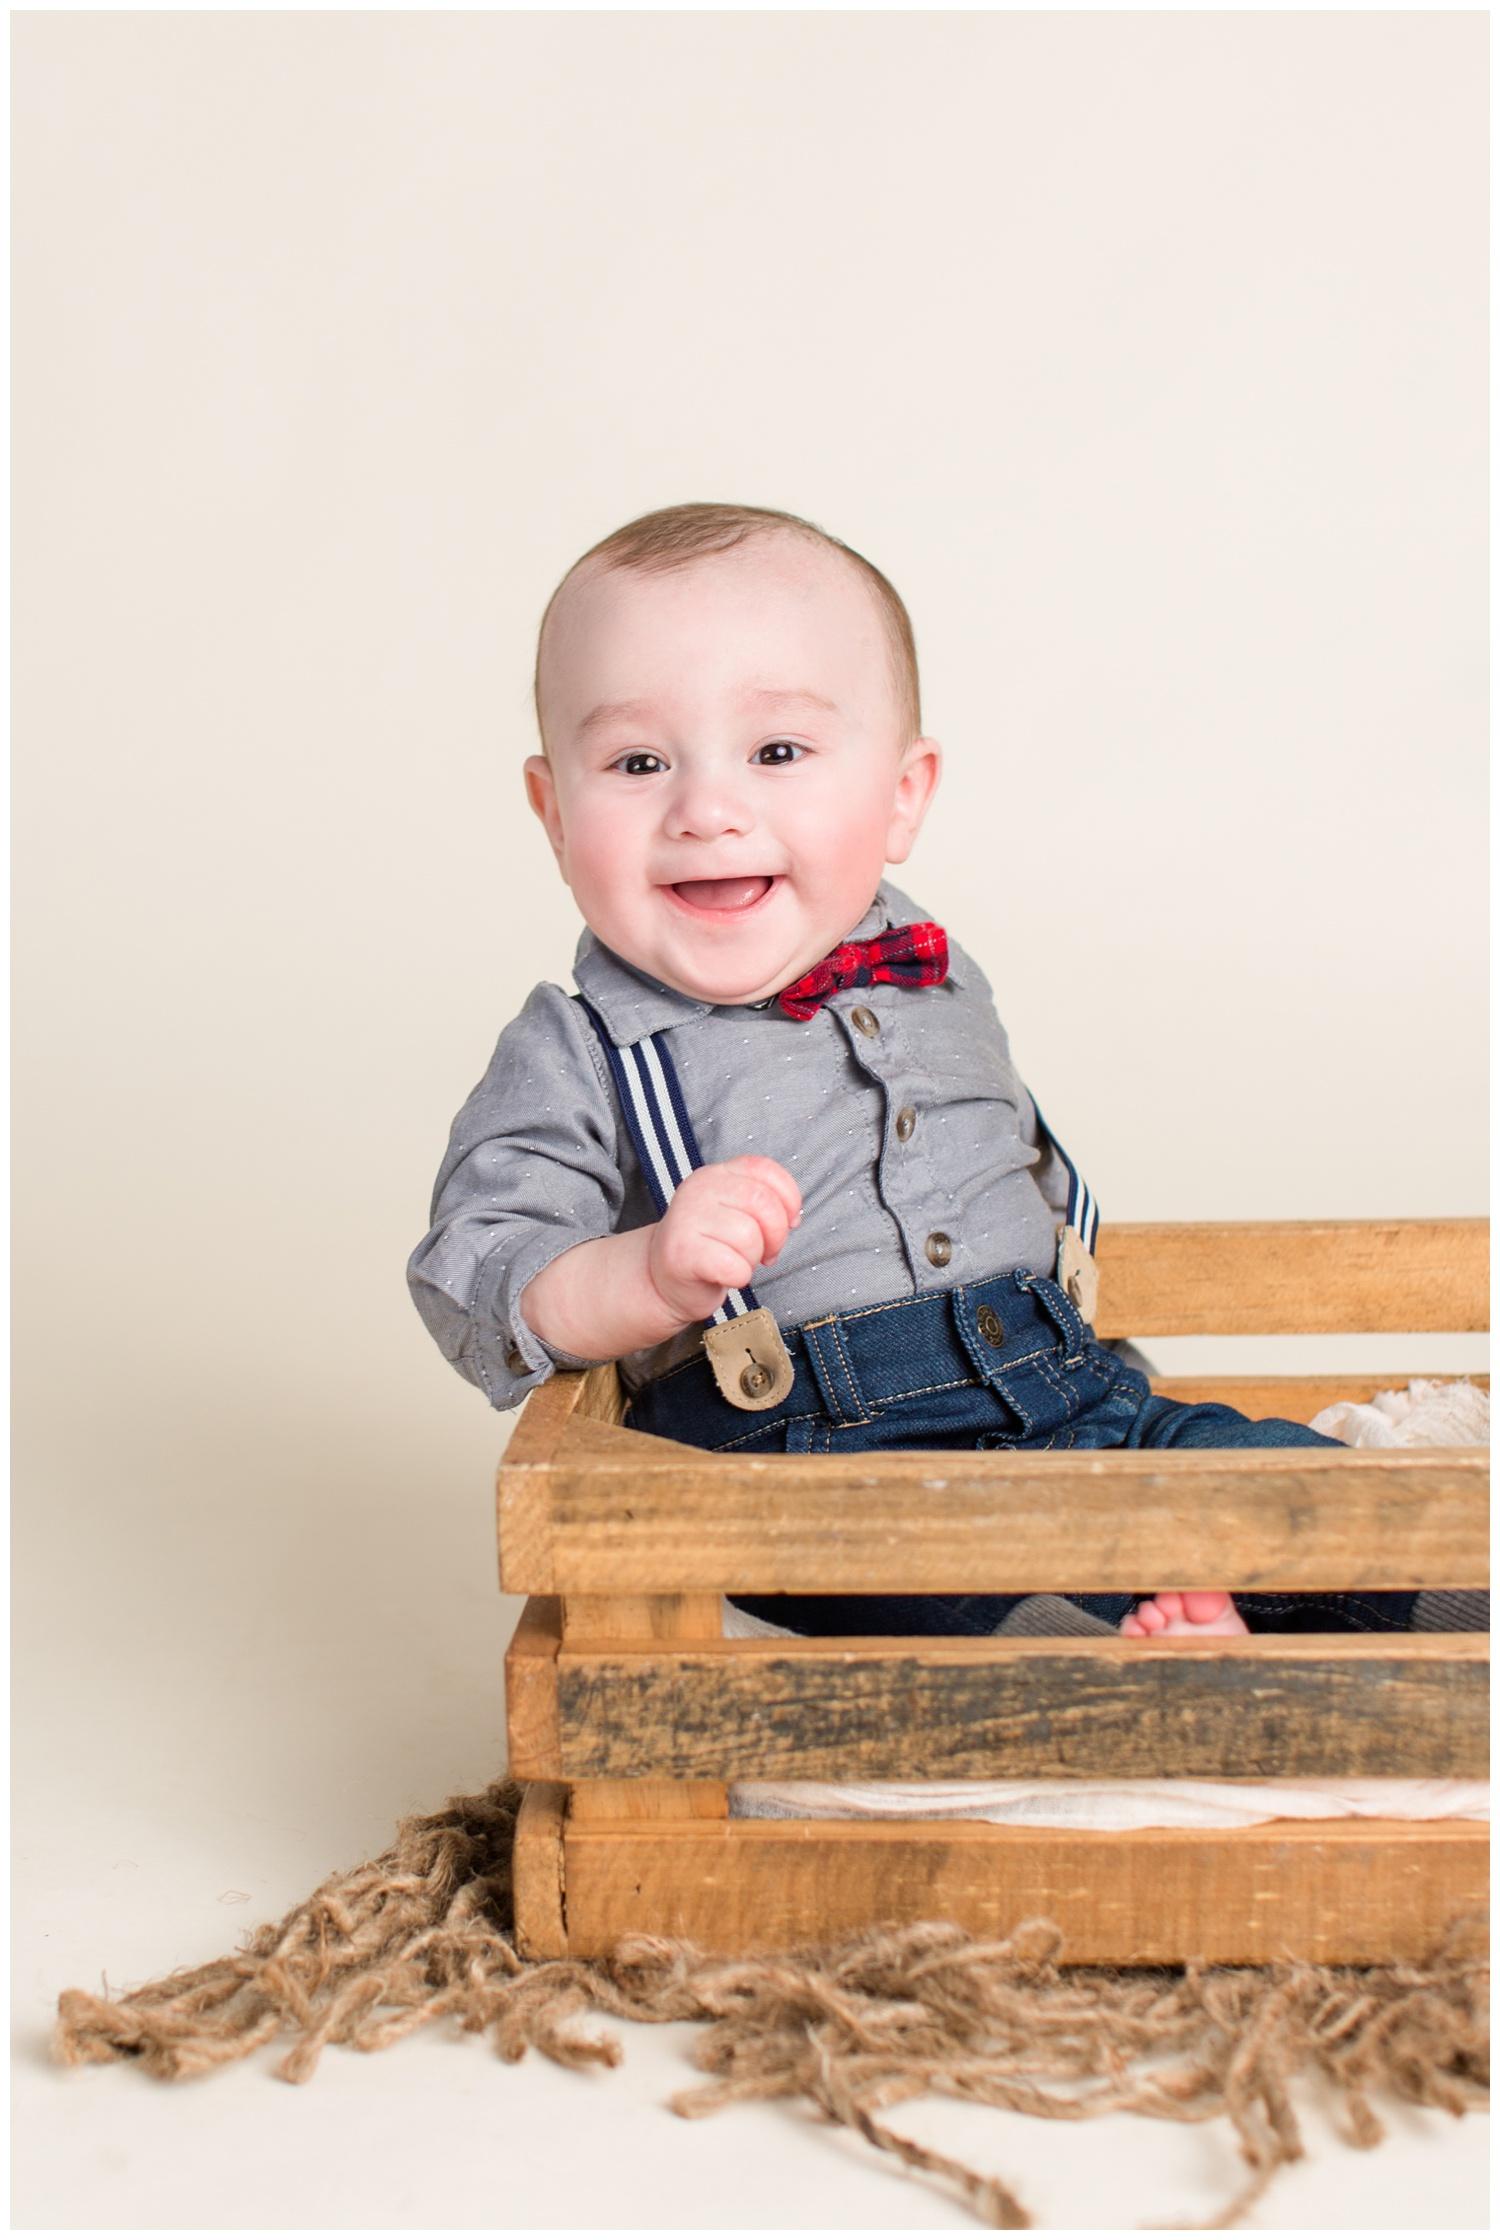 Baby boy sitter session 6 month old photos | Algona Iowa Photographer | CB Studio